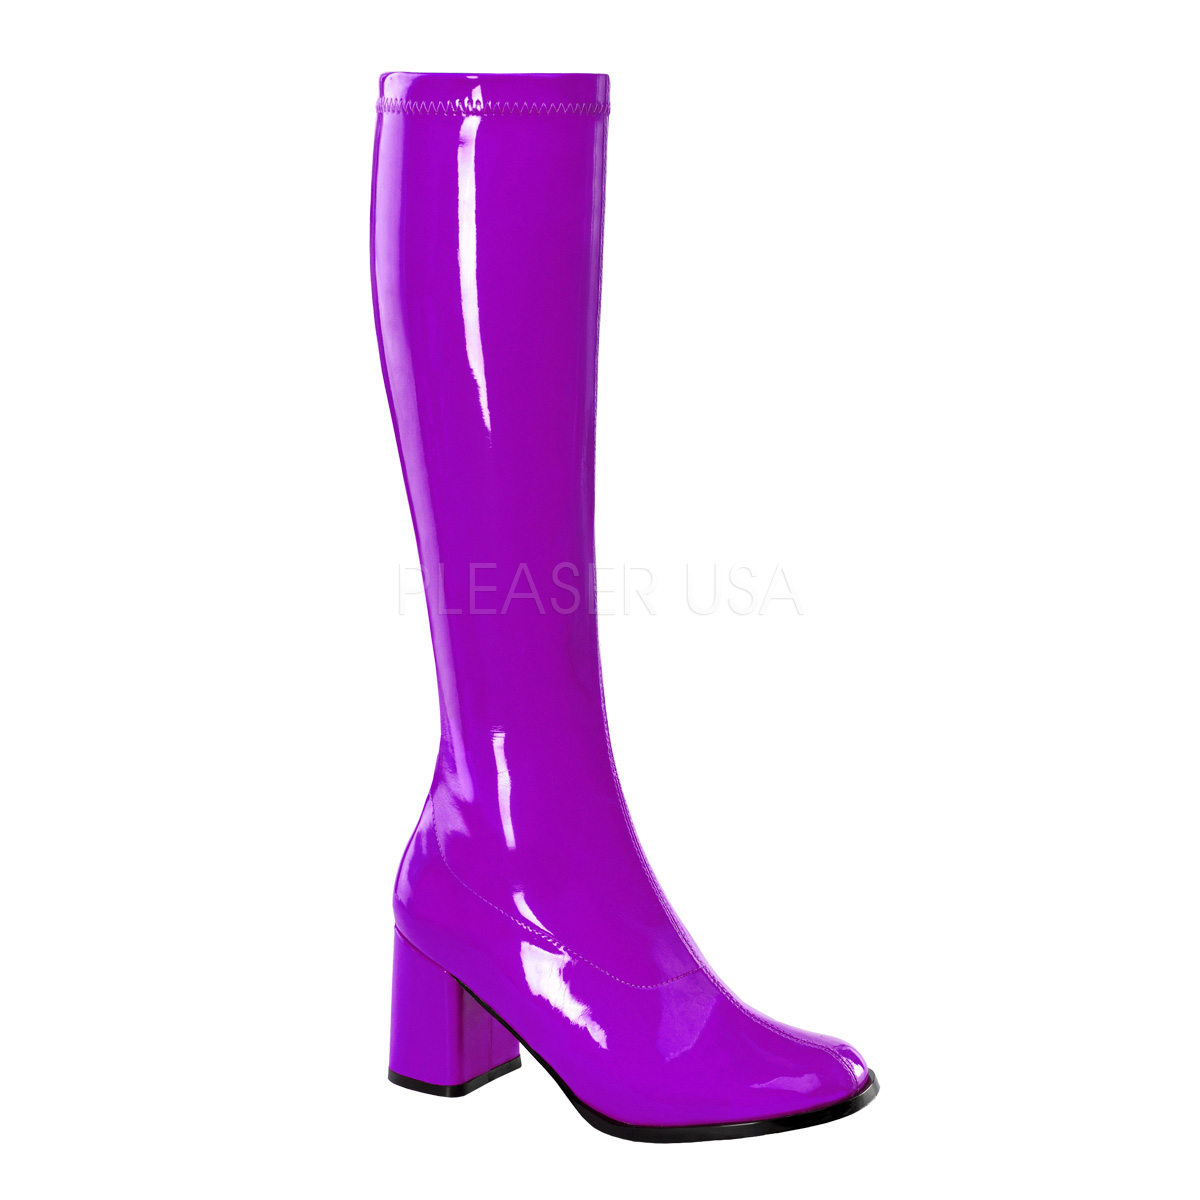 FUNTASMA(Pleaser) GOGO-300 パープル/紫 ニーハイブーツ GOGOブーツ コスプレ用ブーツ イベント 衣装 仮装 ハロウィン◆取り寄せ